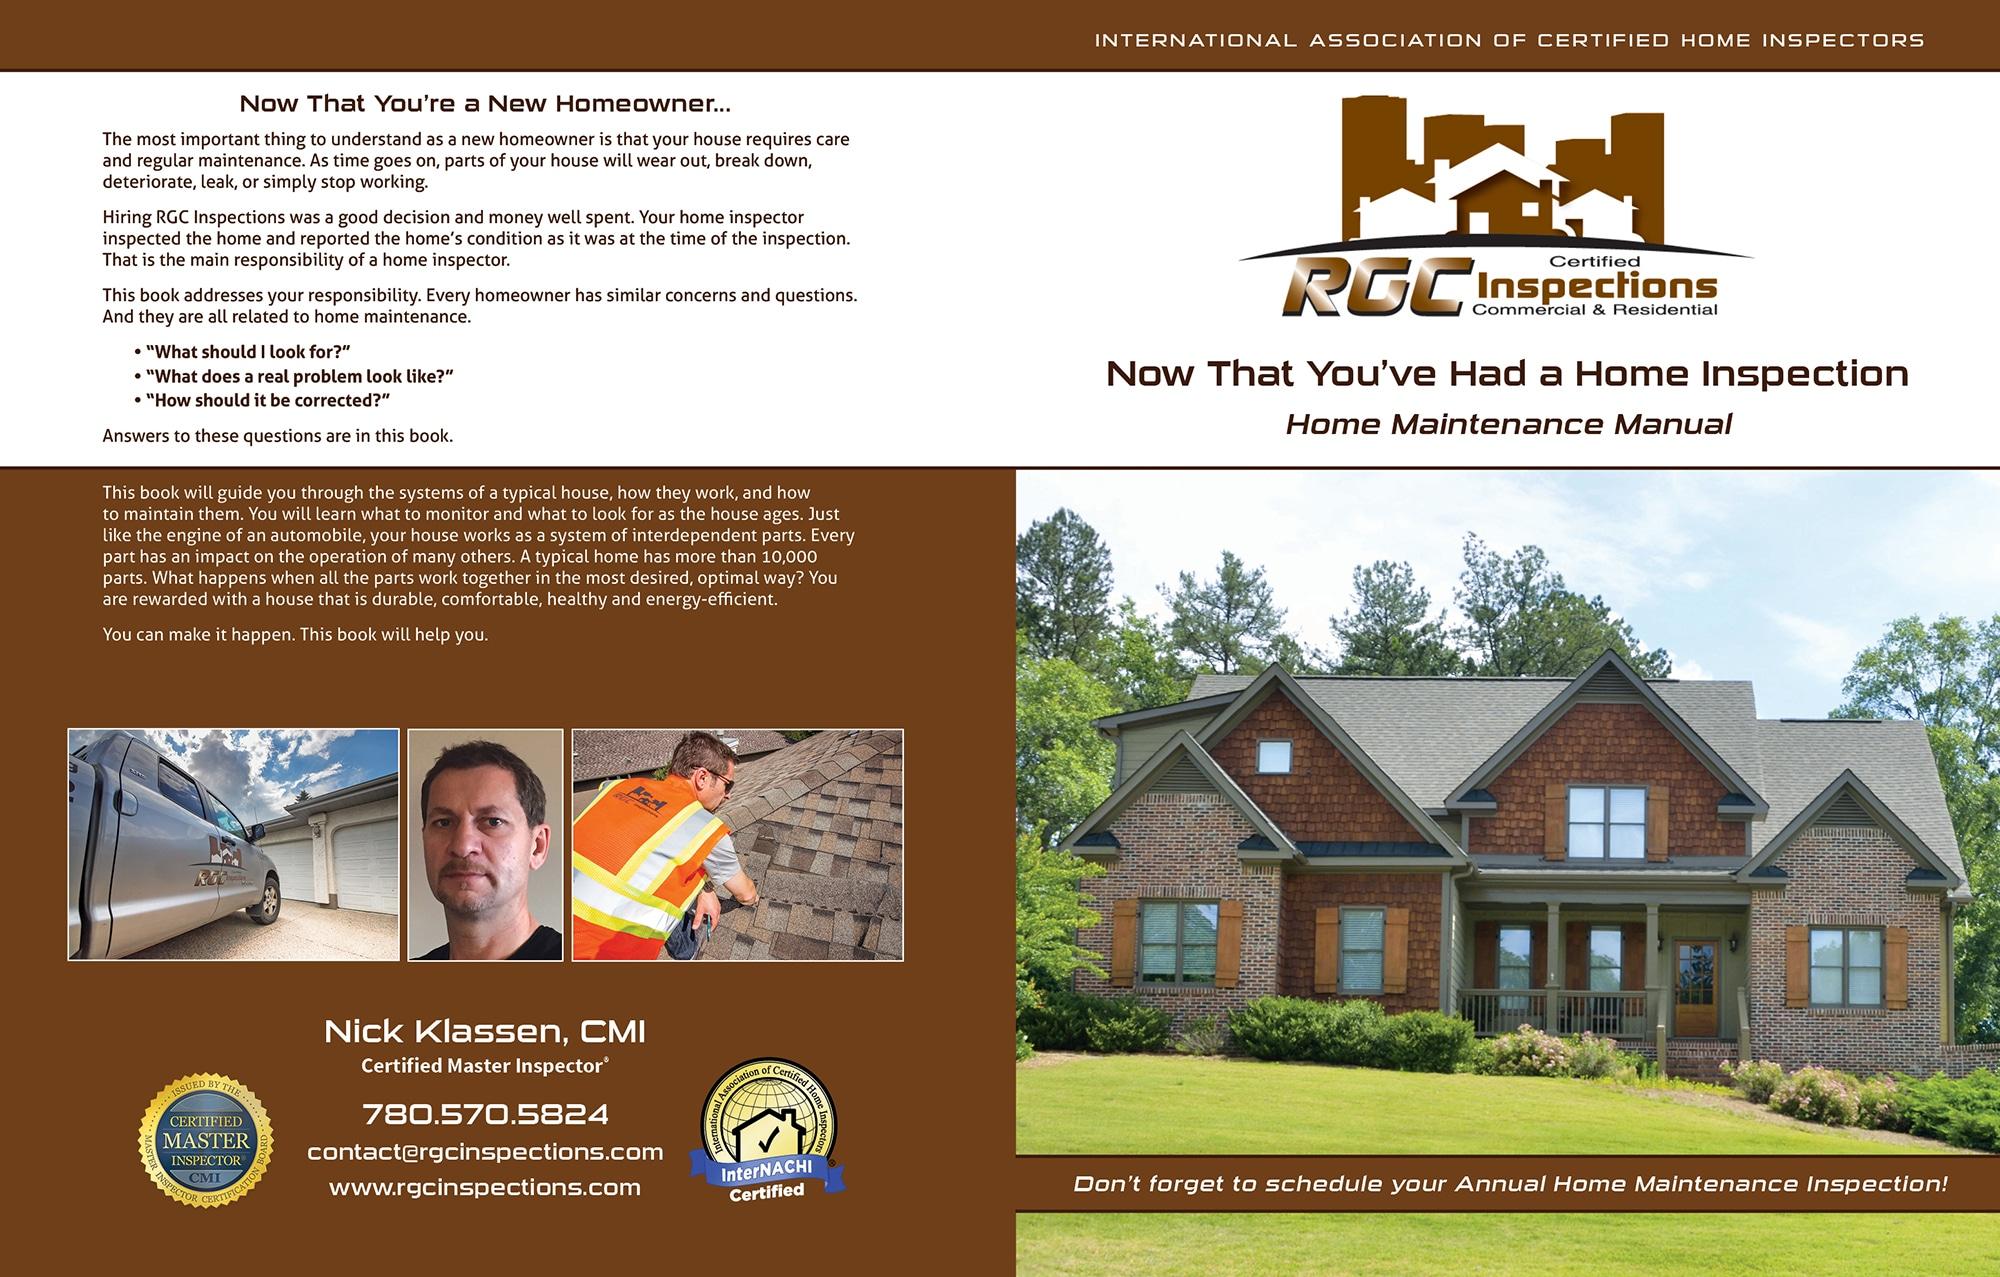 Custom Home Maintenance Book for RCC Inspections.